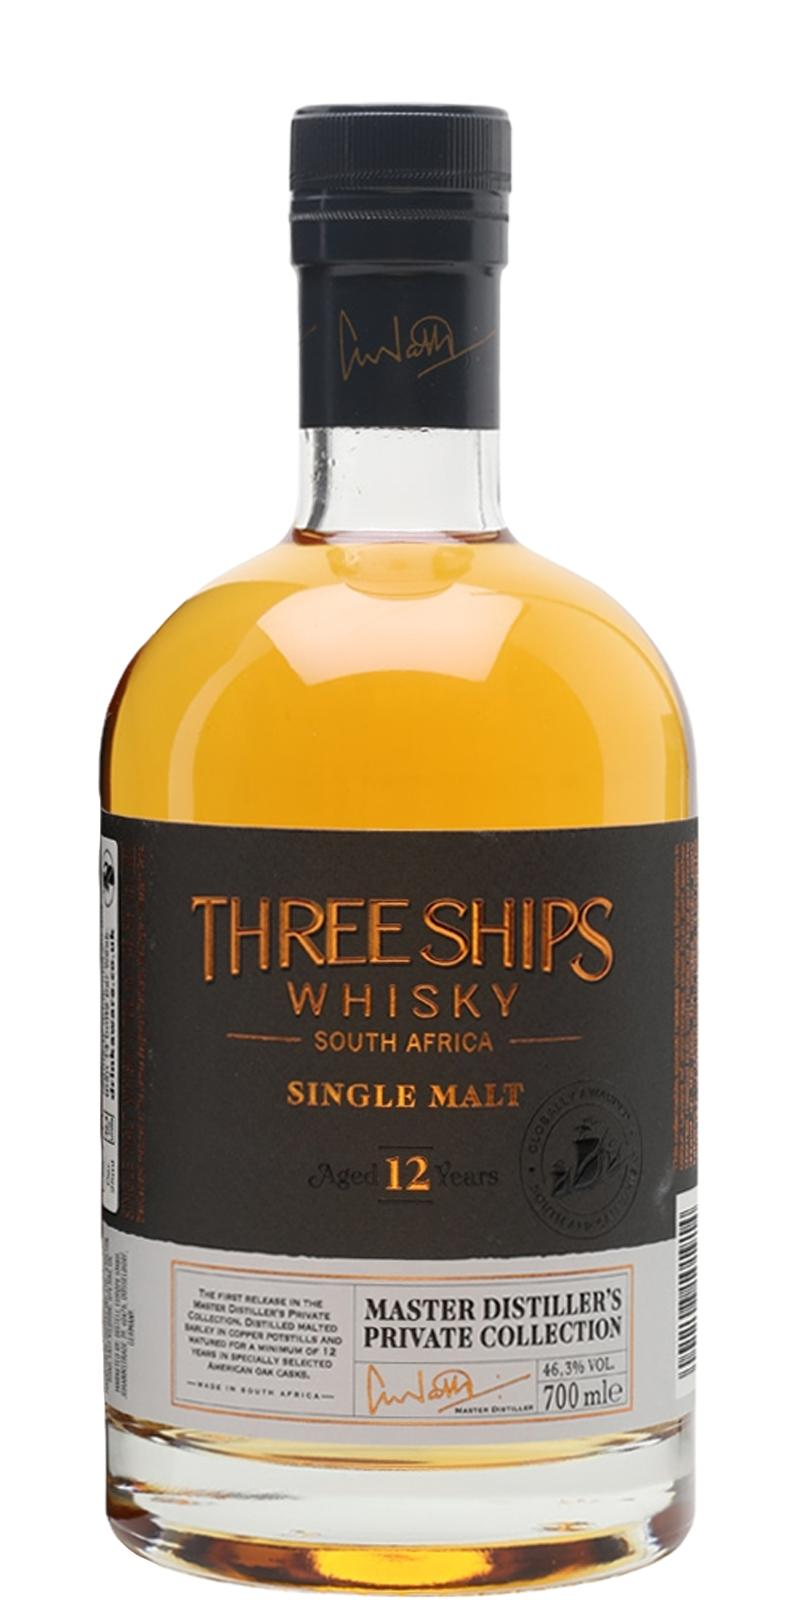 Three Ships 12-year-old